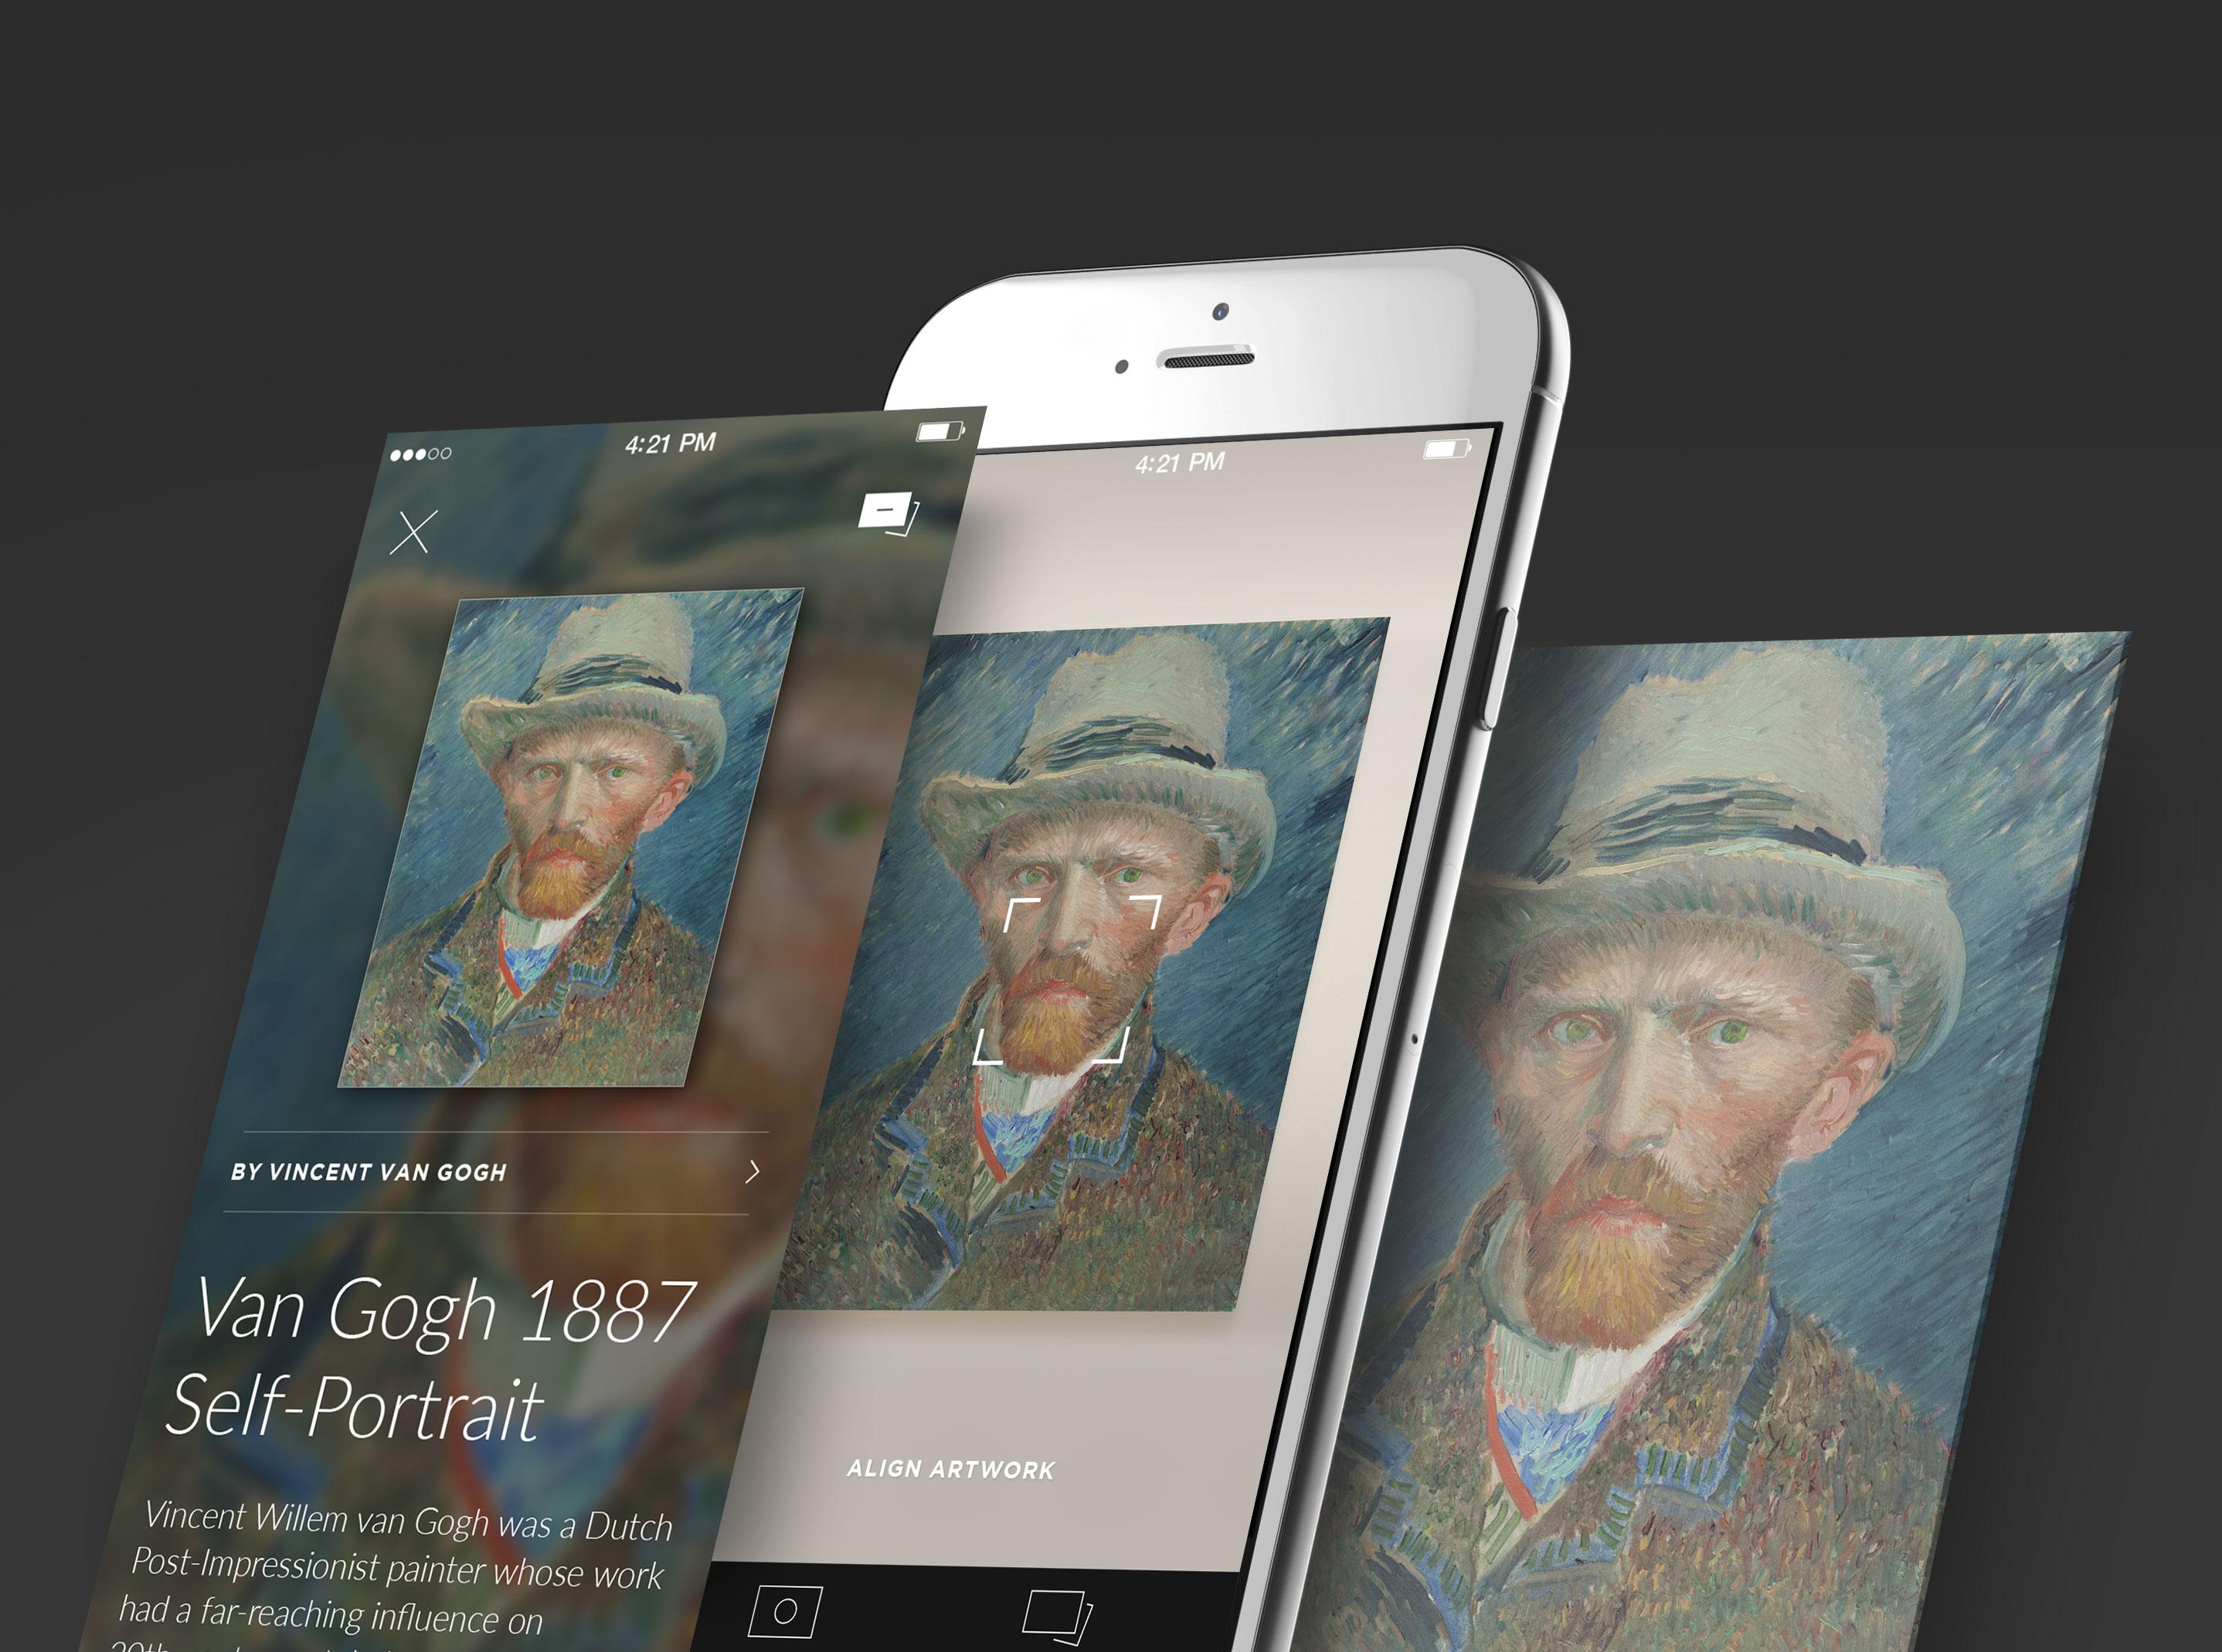 Smartify kunst-app met Van Gogh